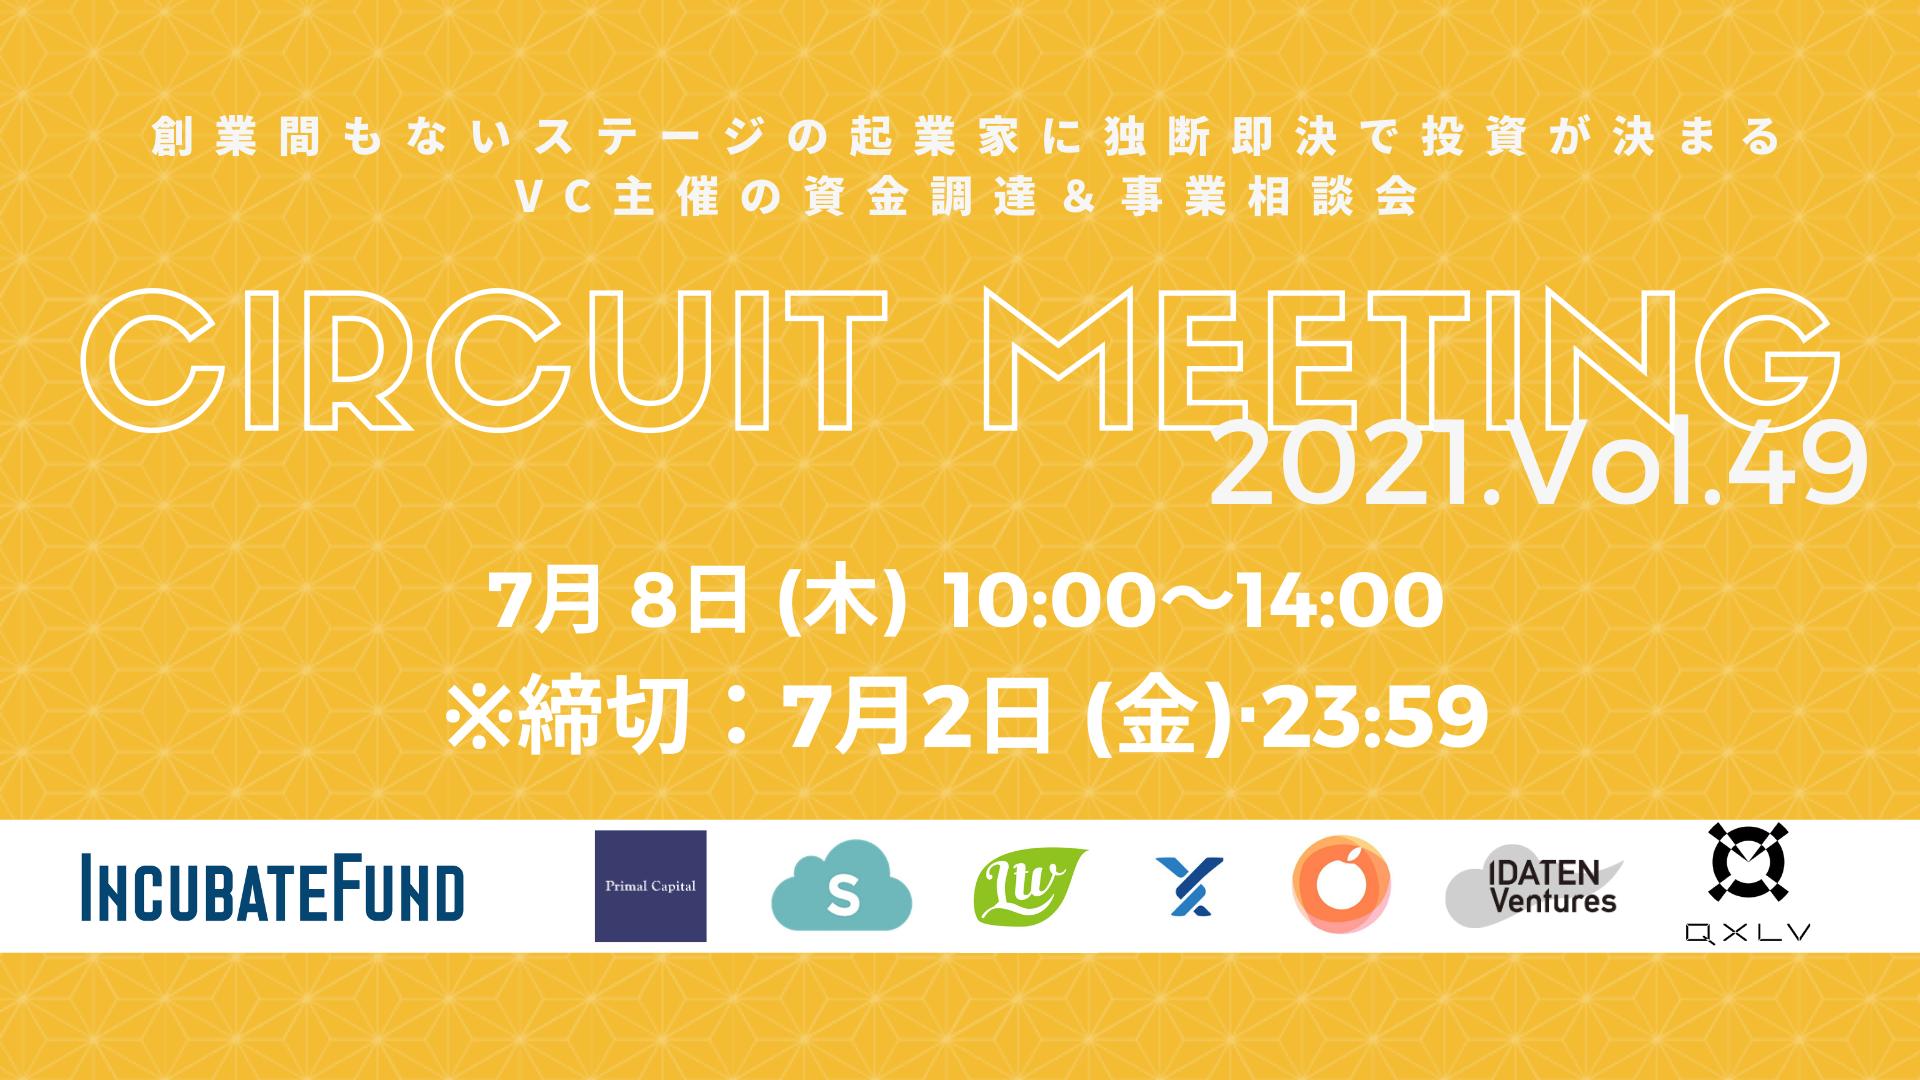 【7/2締切】Circuit Meeting Vol.49